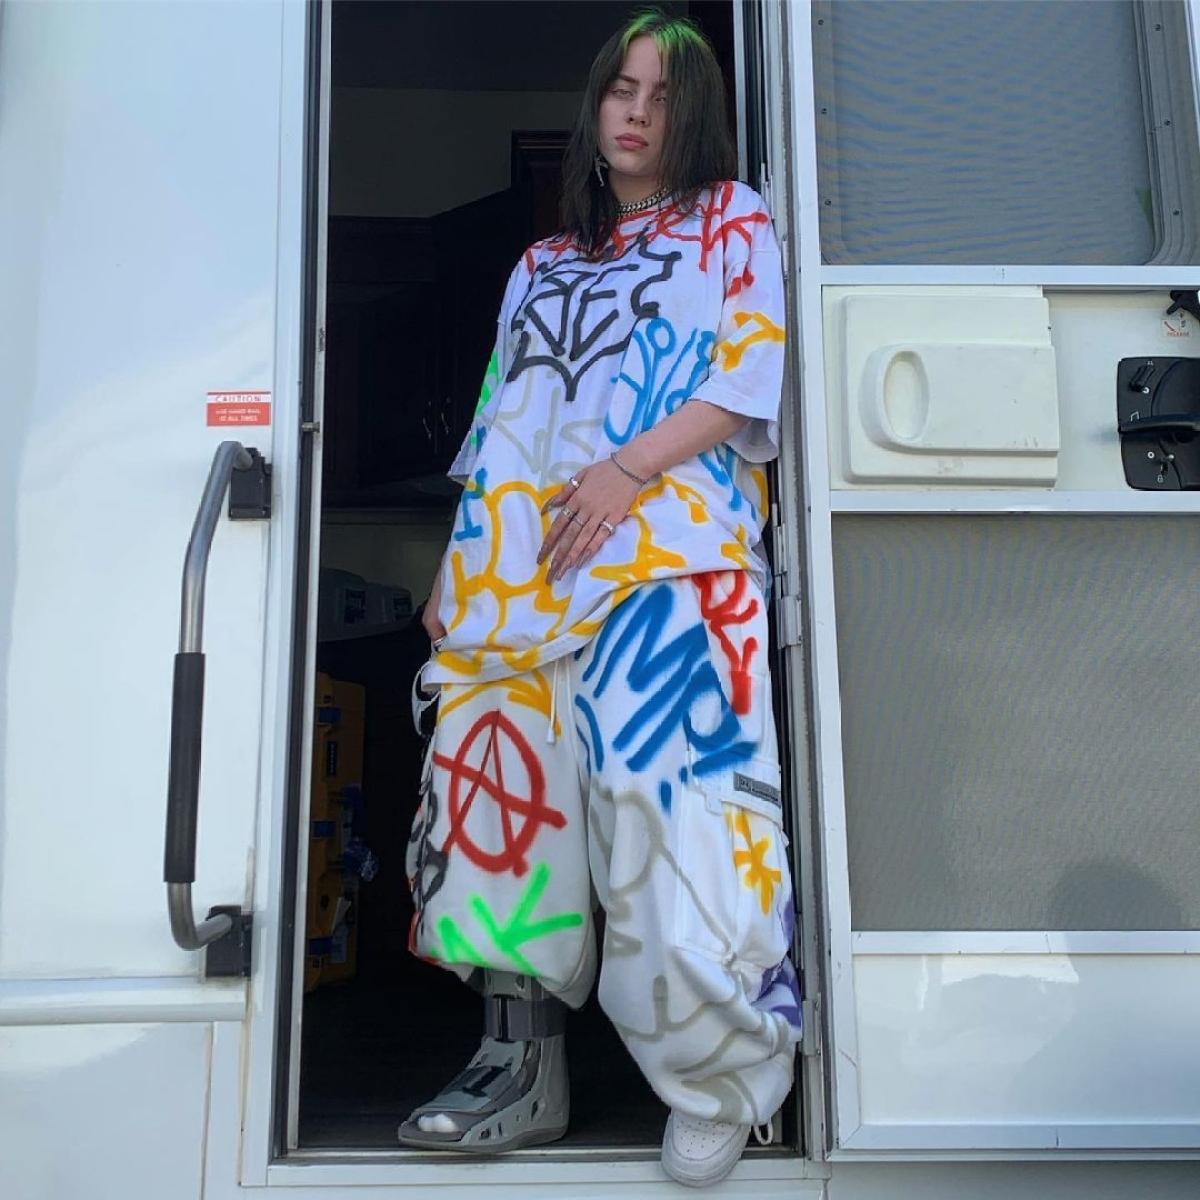 Billie Eilish shuts down body-shamers who called her 'fat'